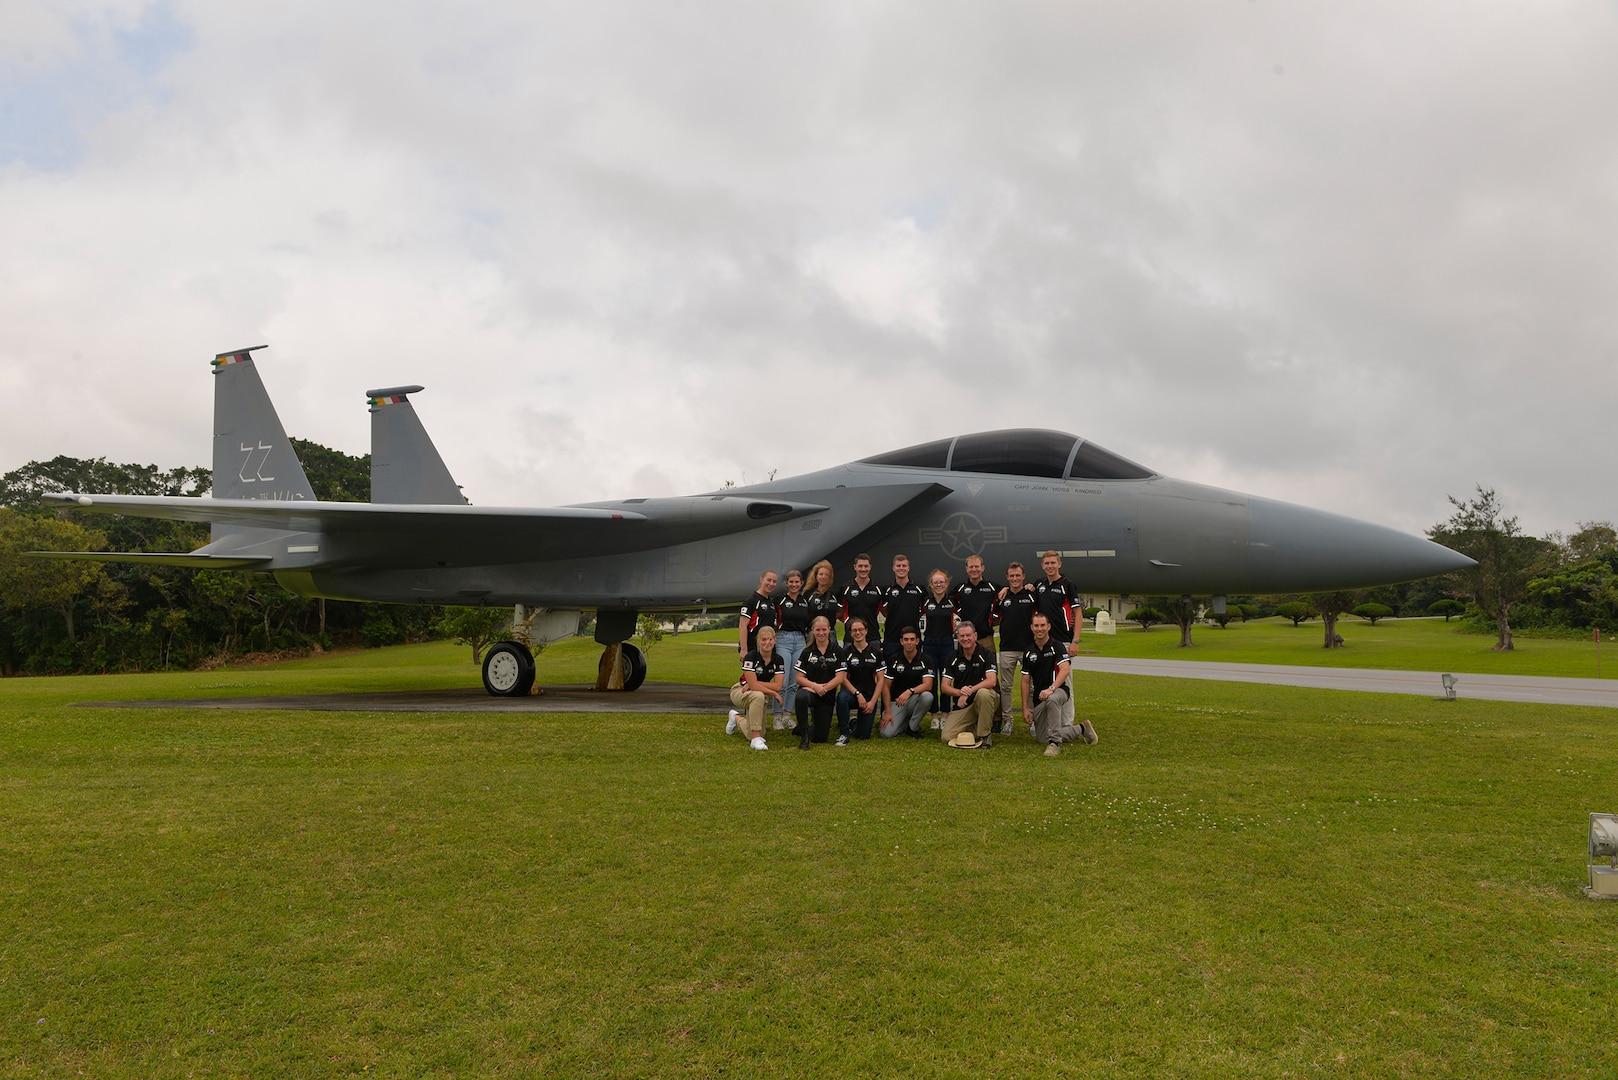 Australian Defence Force Academy Visits Kadana, Learns about the Battle of Okinawa